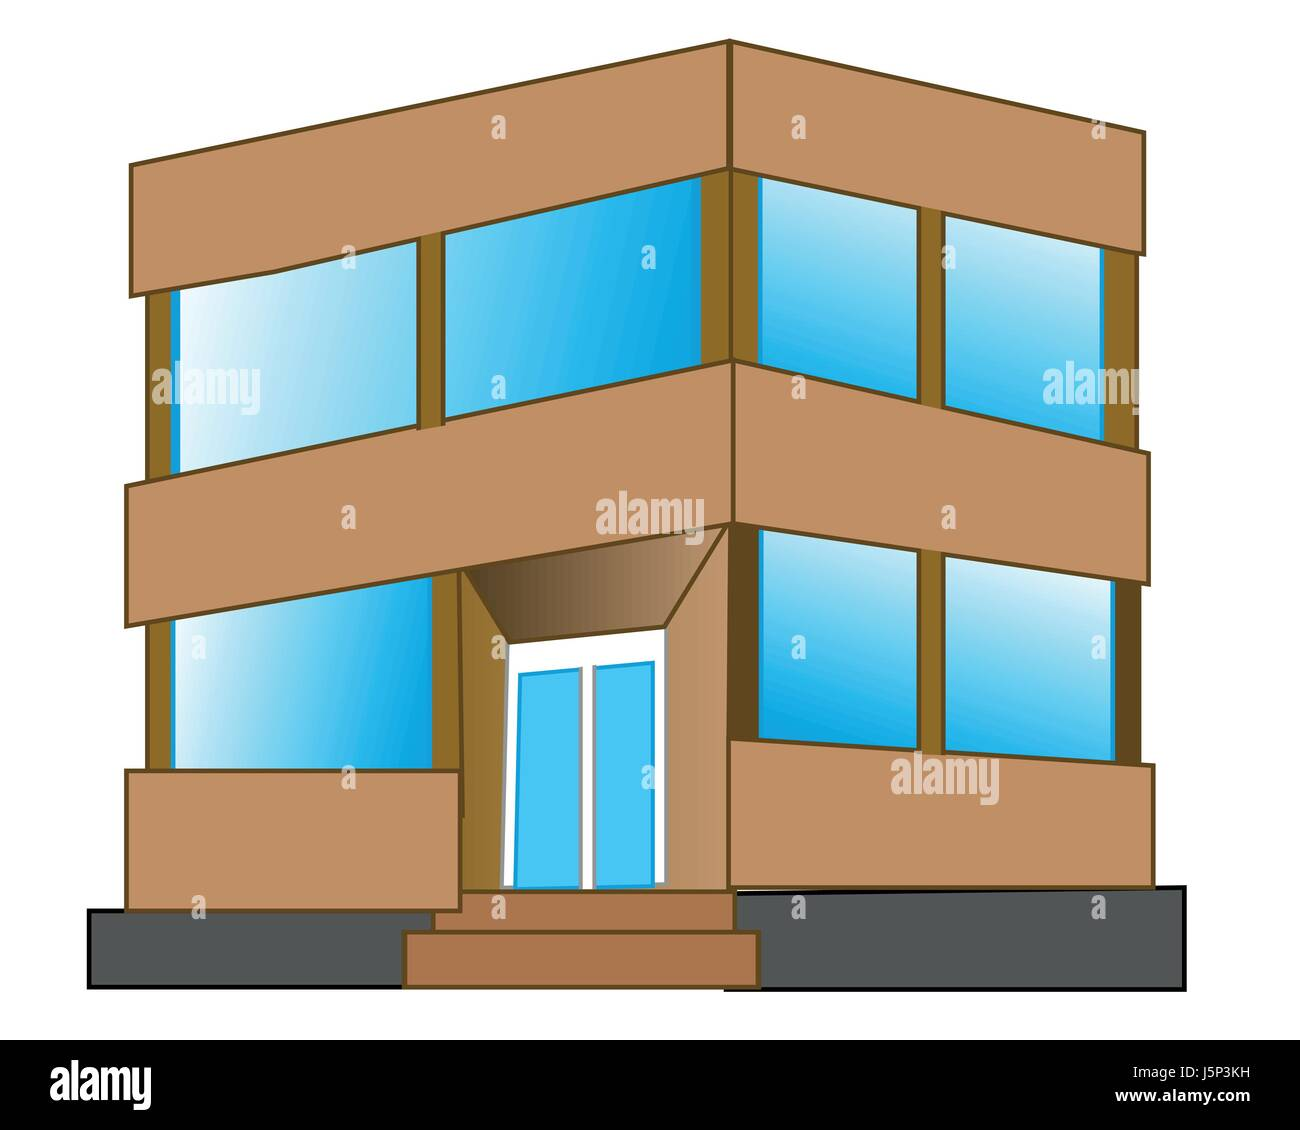 Small gray building - Stock Vector